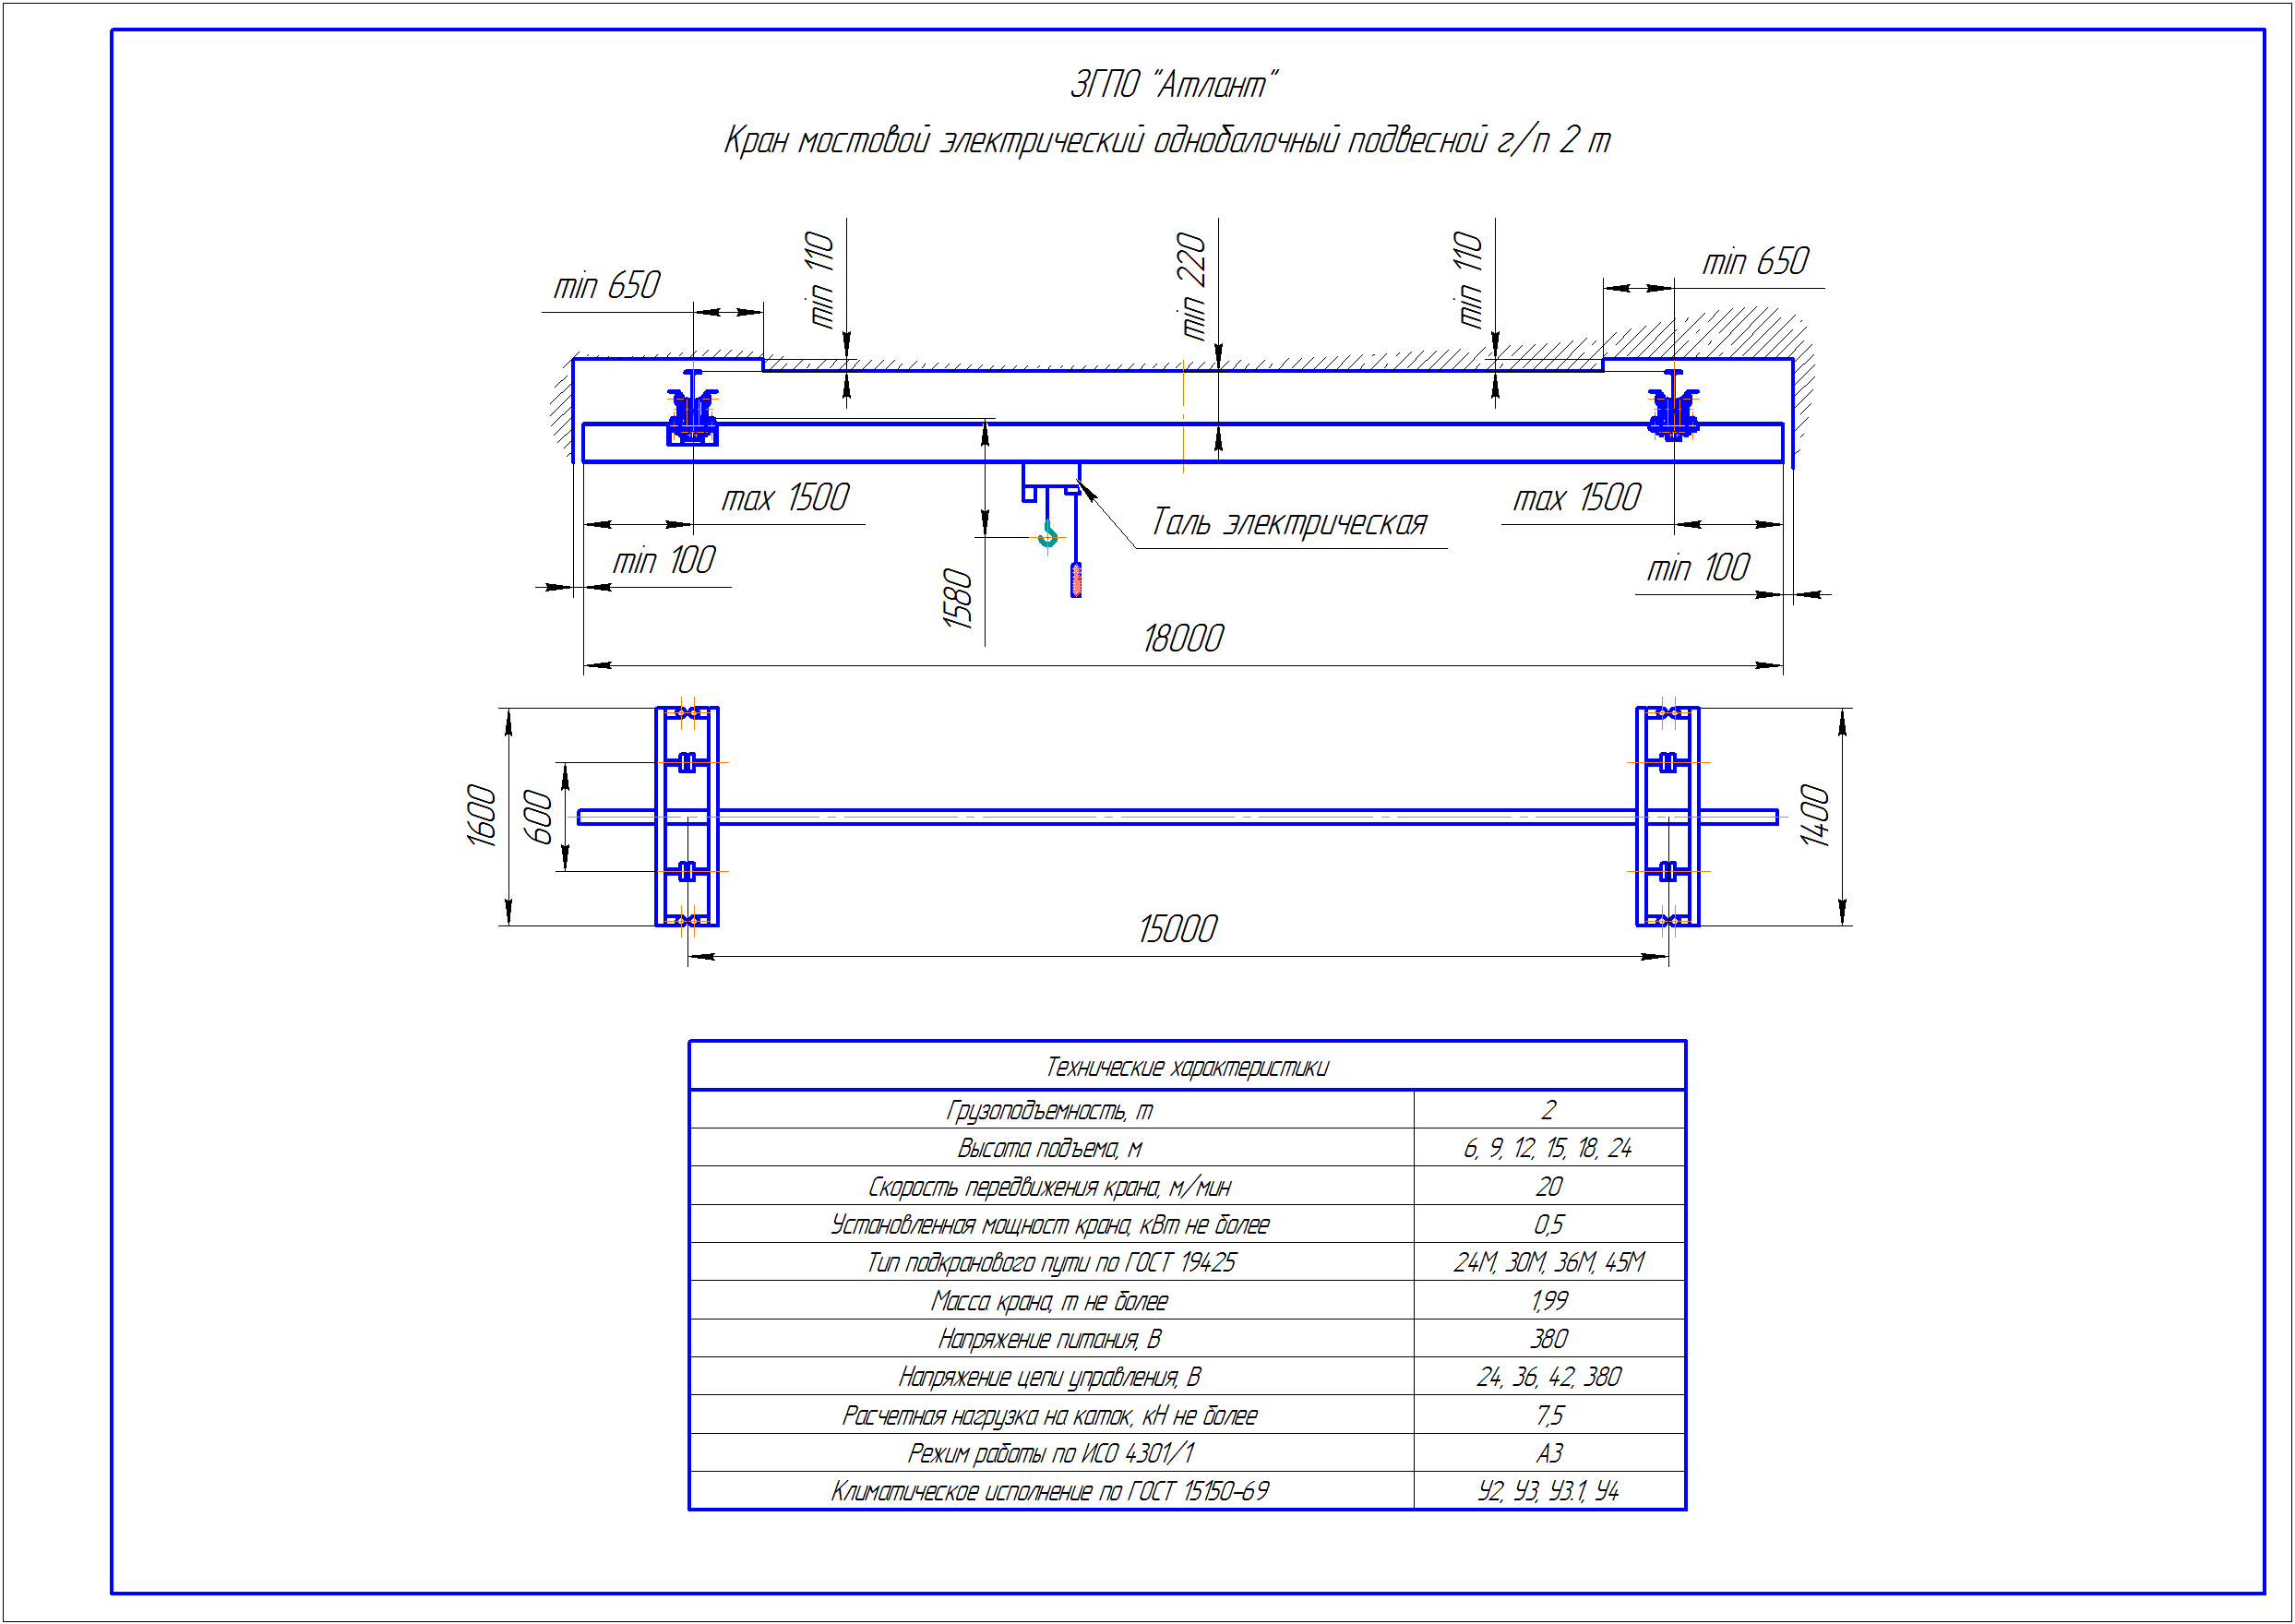 KBP 2 5 - Подвесная кран балка